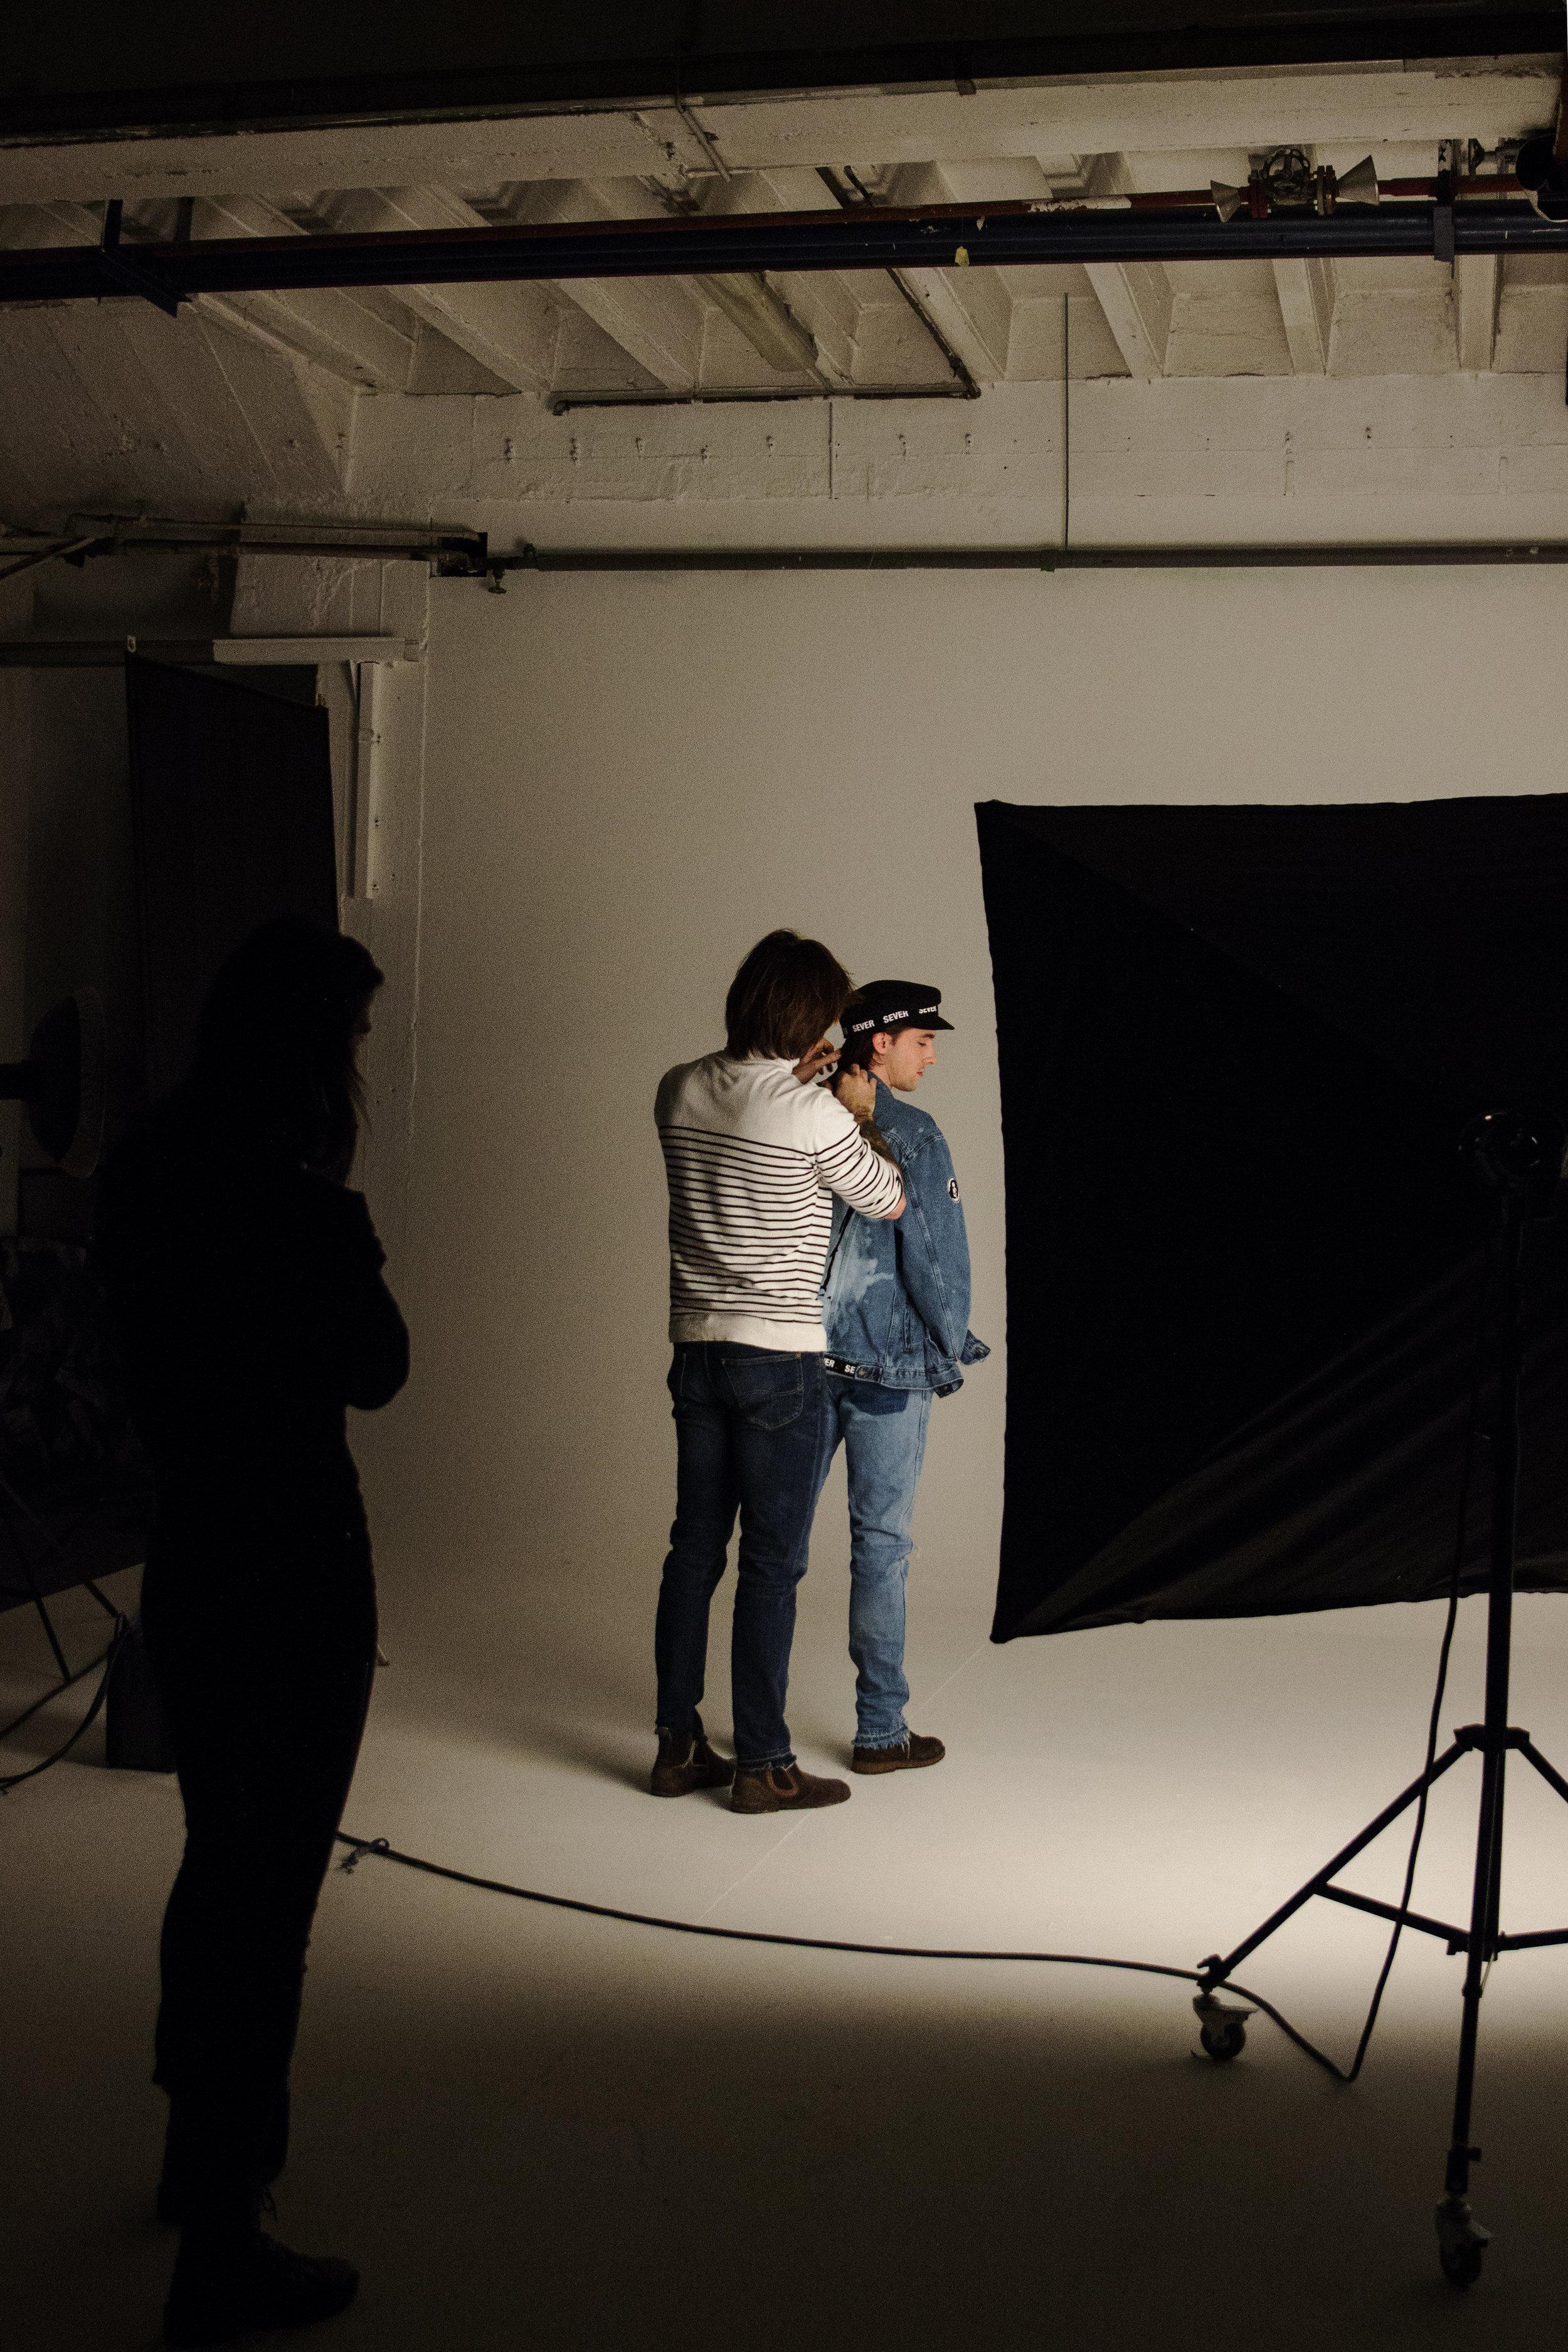 robert-sever-kolekcija-dizajner-behind-the-scenes-luka-lajic-photography (2).jpg